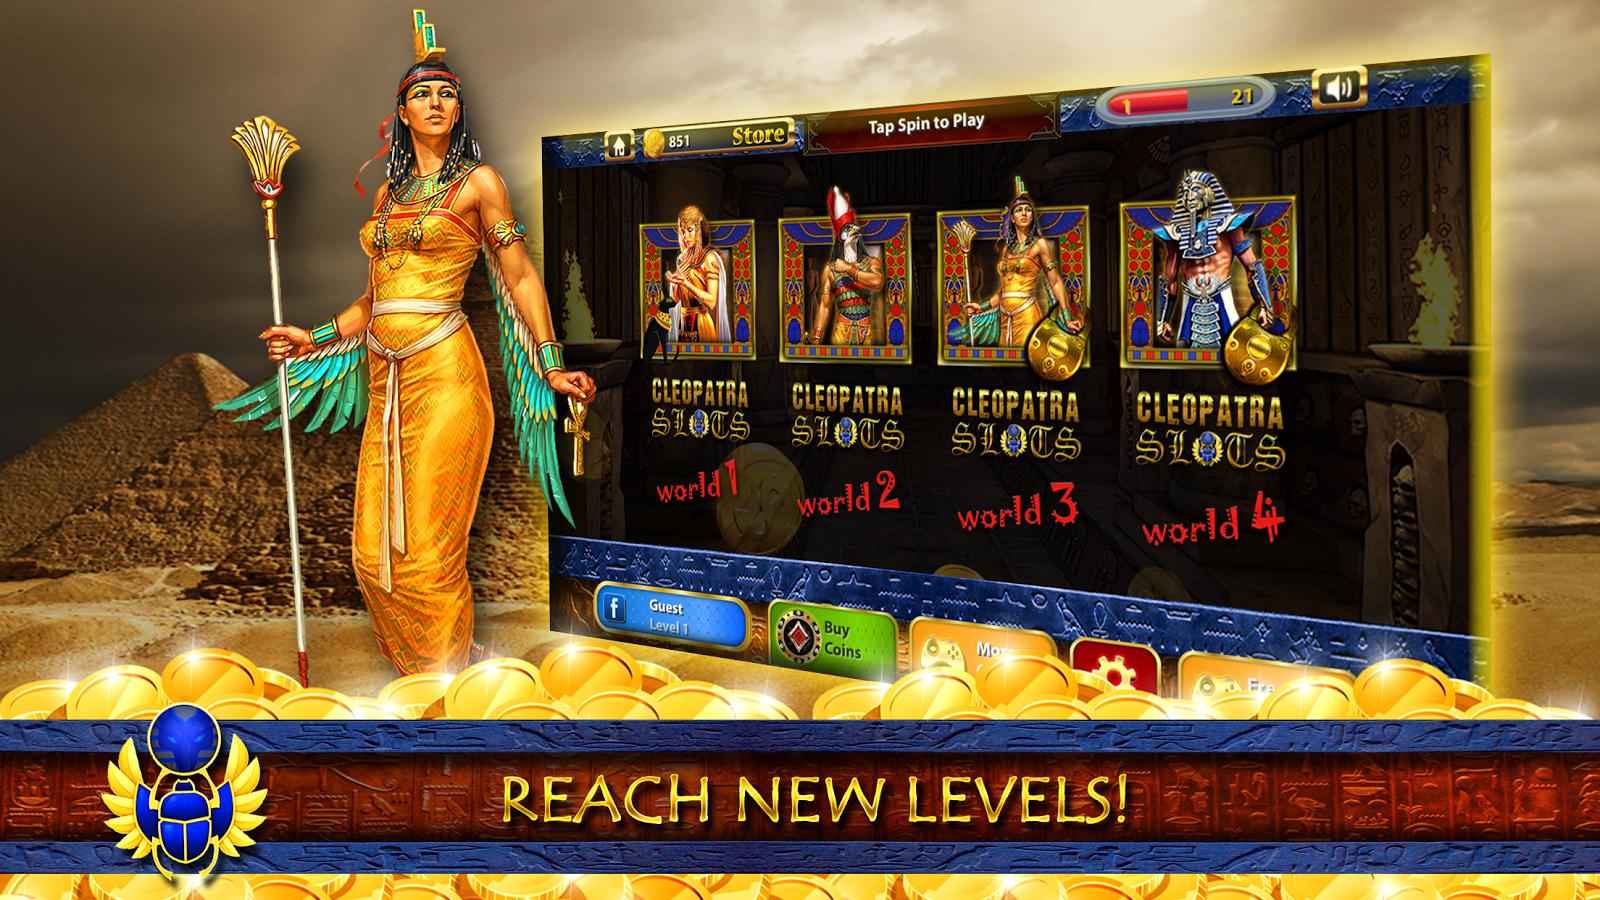 Cleopatra poker machine